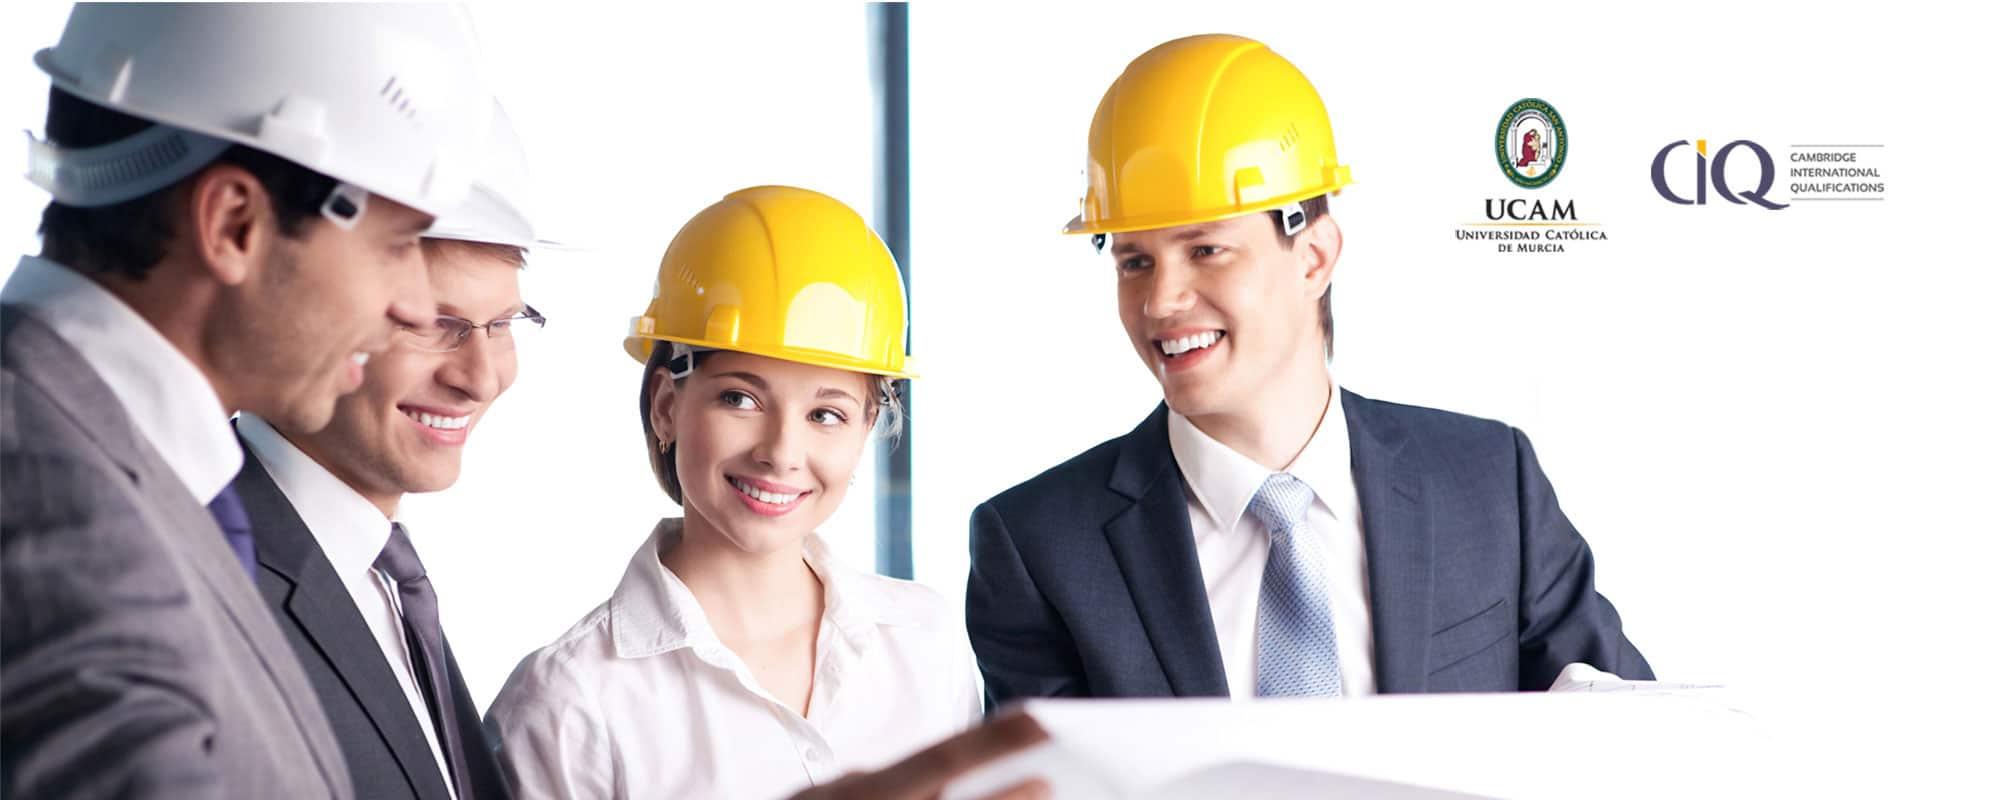 MBA in Engineering Management Dubai, Abu Dhabi, Riyadh, Jeddah, UAE, Saudi Arabia